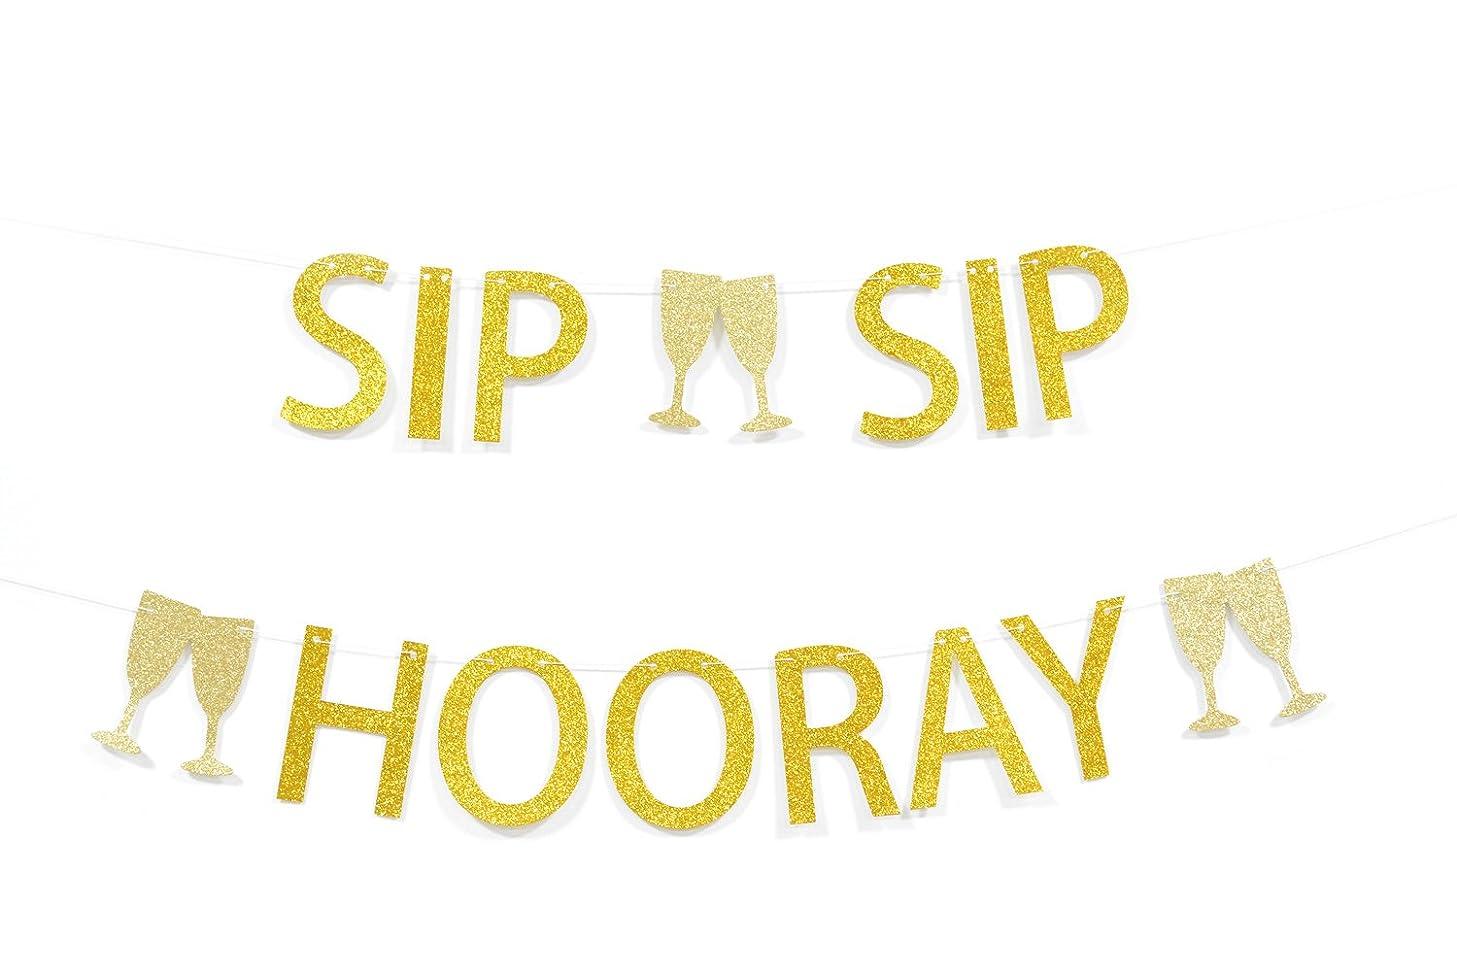 Sip Sip Hooray Gold Glitter Banner for Birthday Graduation Wedding Retirement Party Decorations